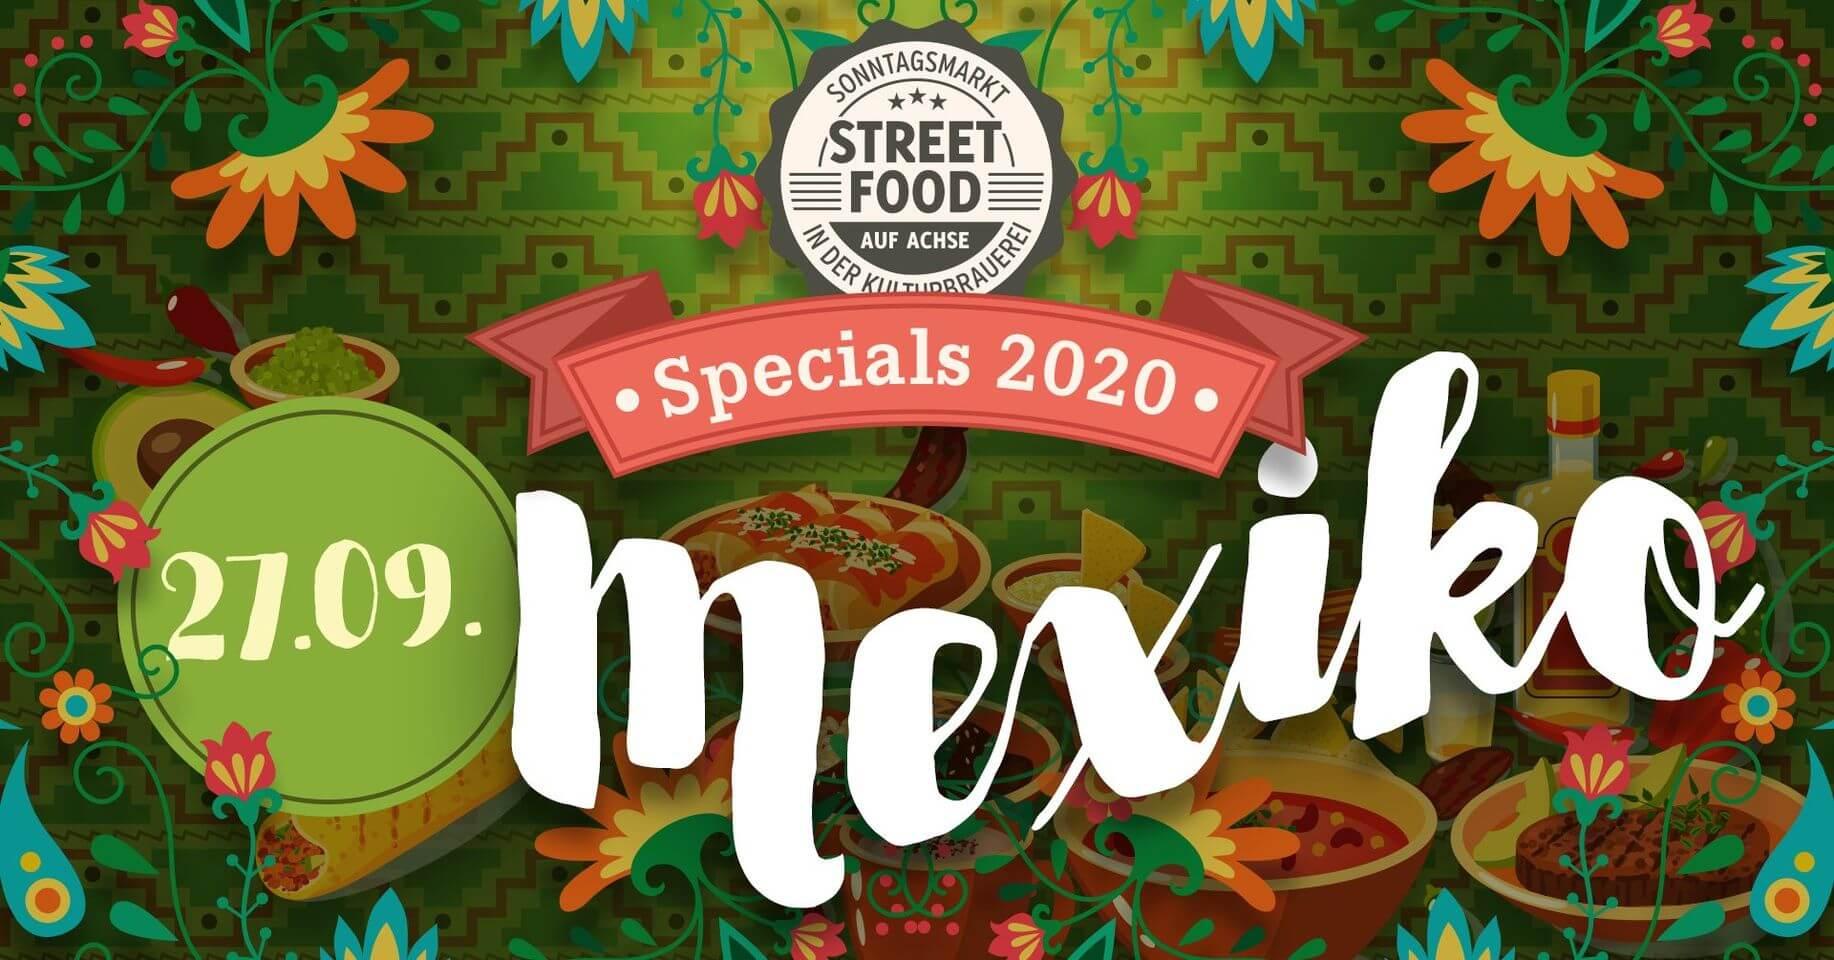 Street Food auf Achse Spezial Mexico